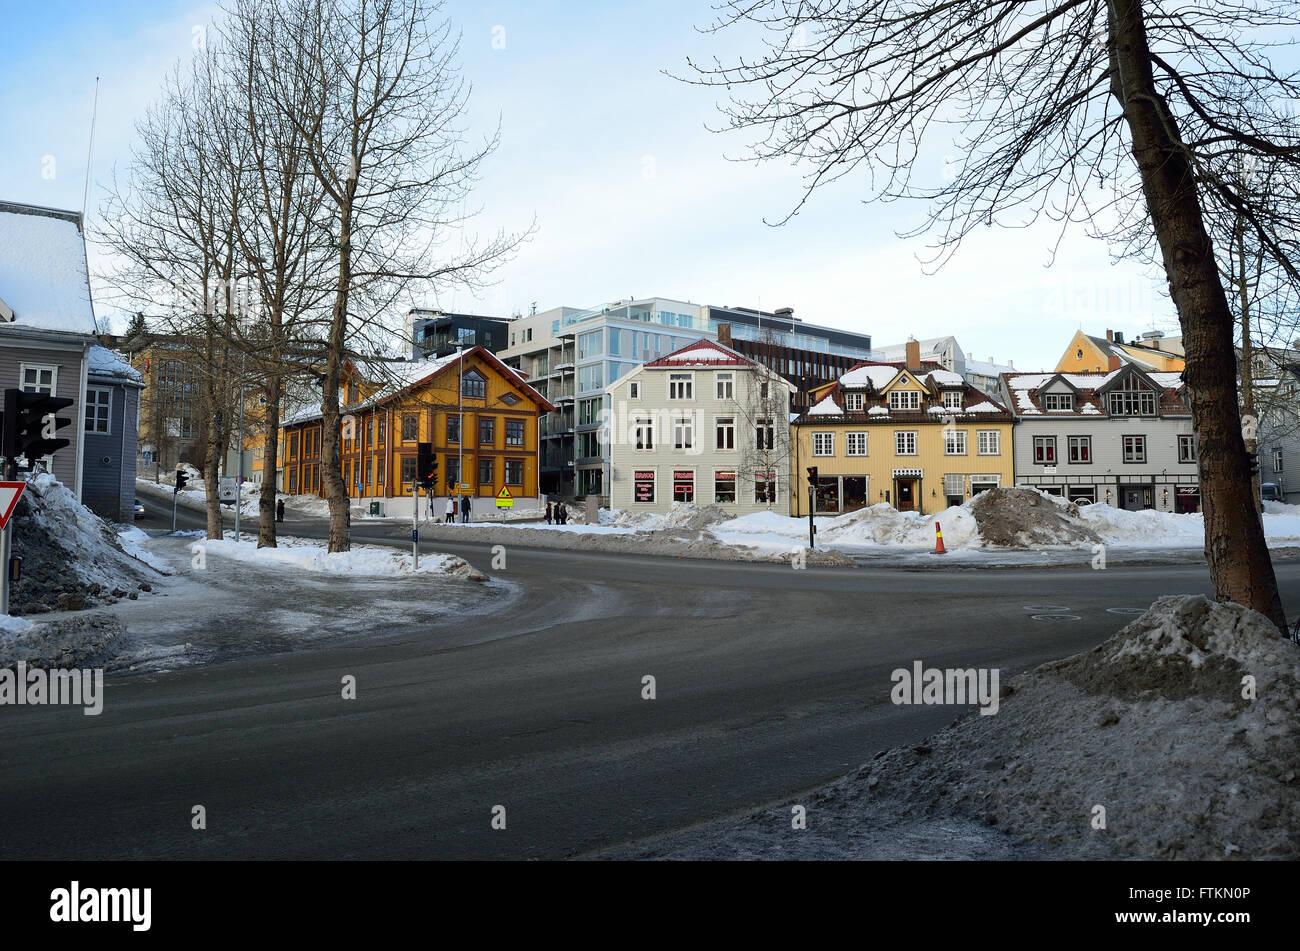 tromsoe city sentrum 20th february 2016 - Stock Image